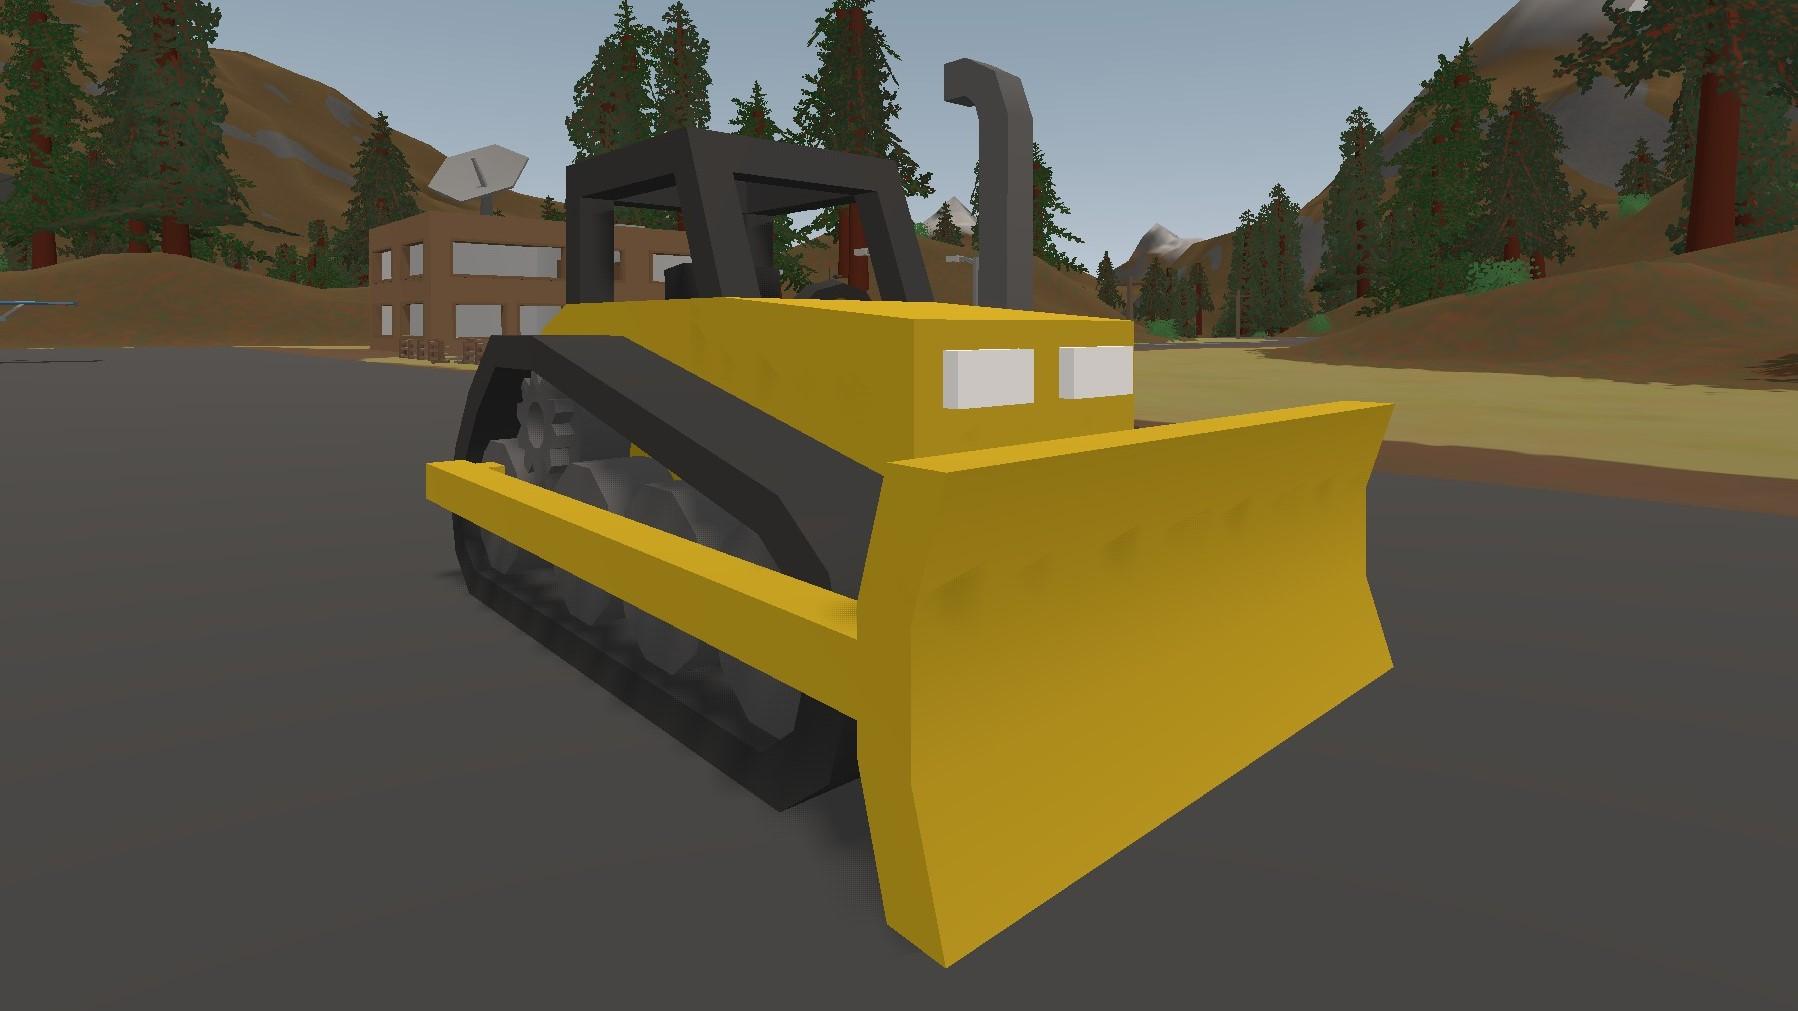 Bulldozer | Unturned Bunker Wiki | FANDOM powered by Wikia